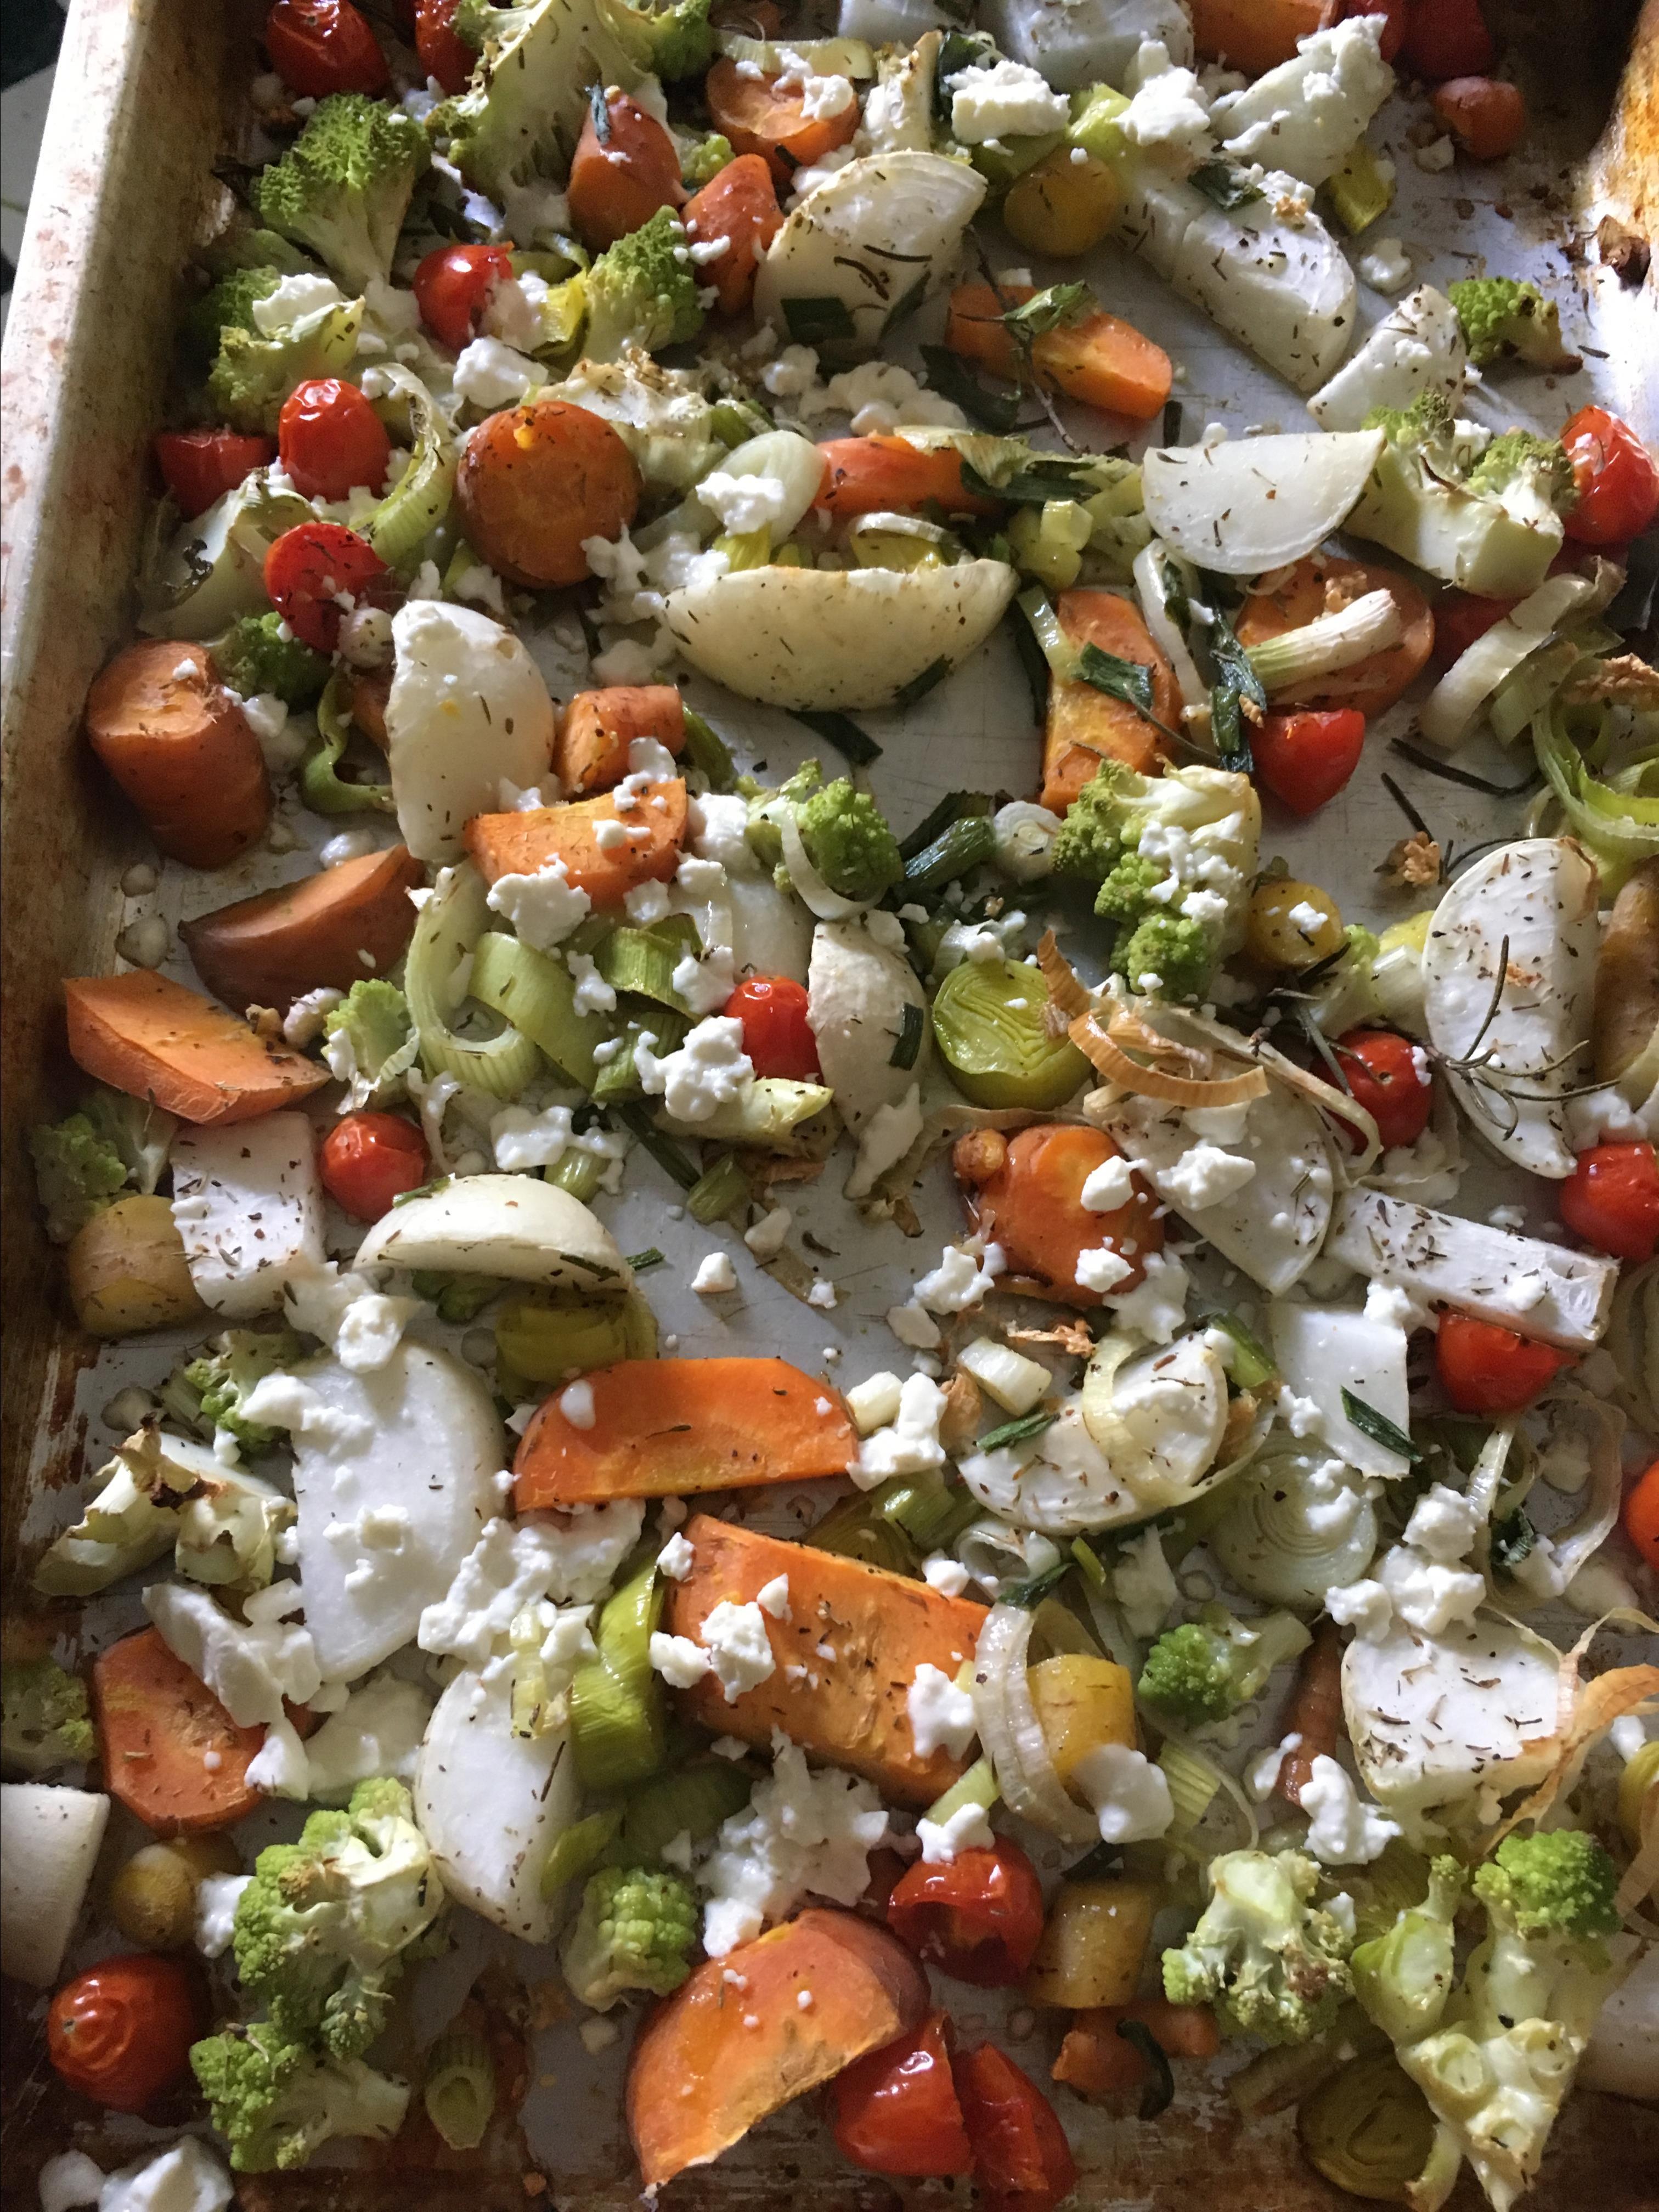 Sheet Pan Vegetable Dinner with Feta